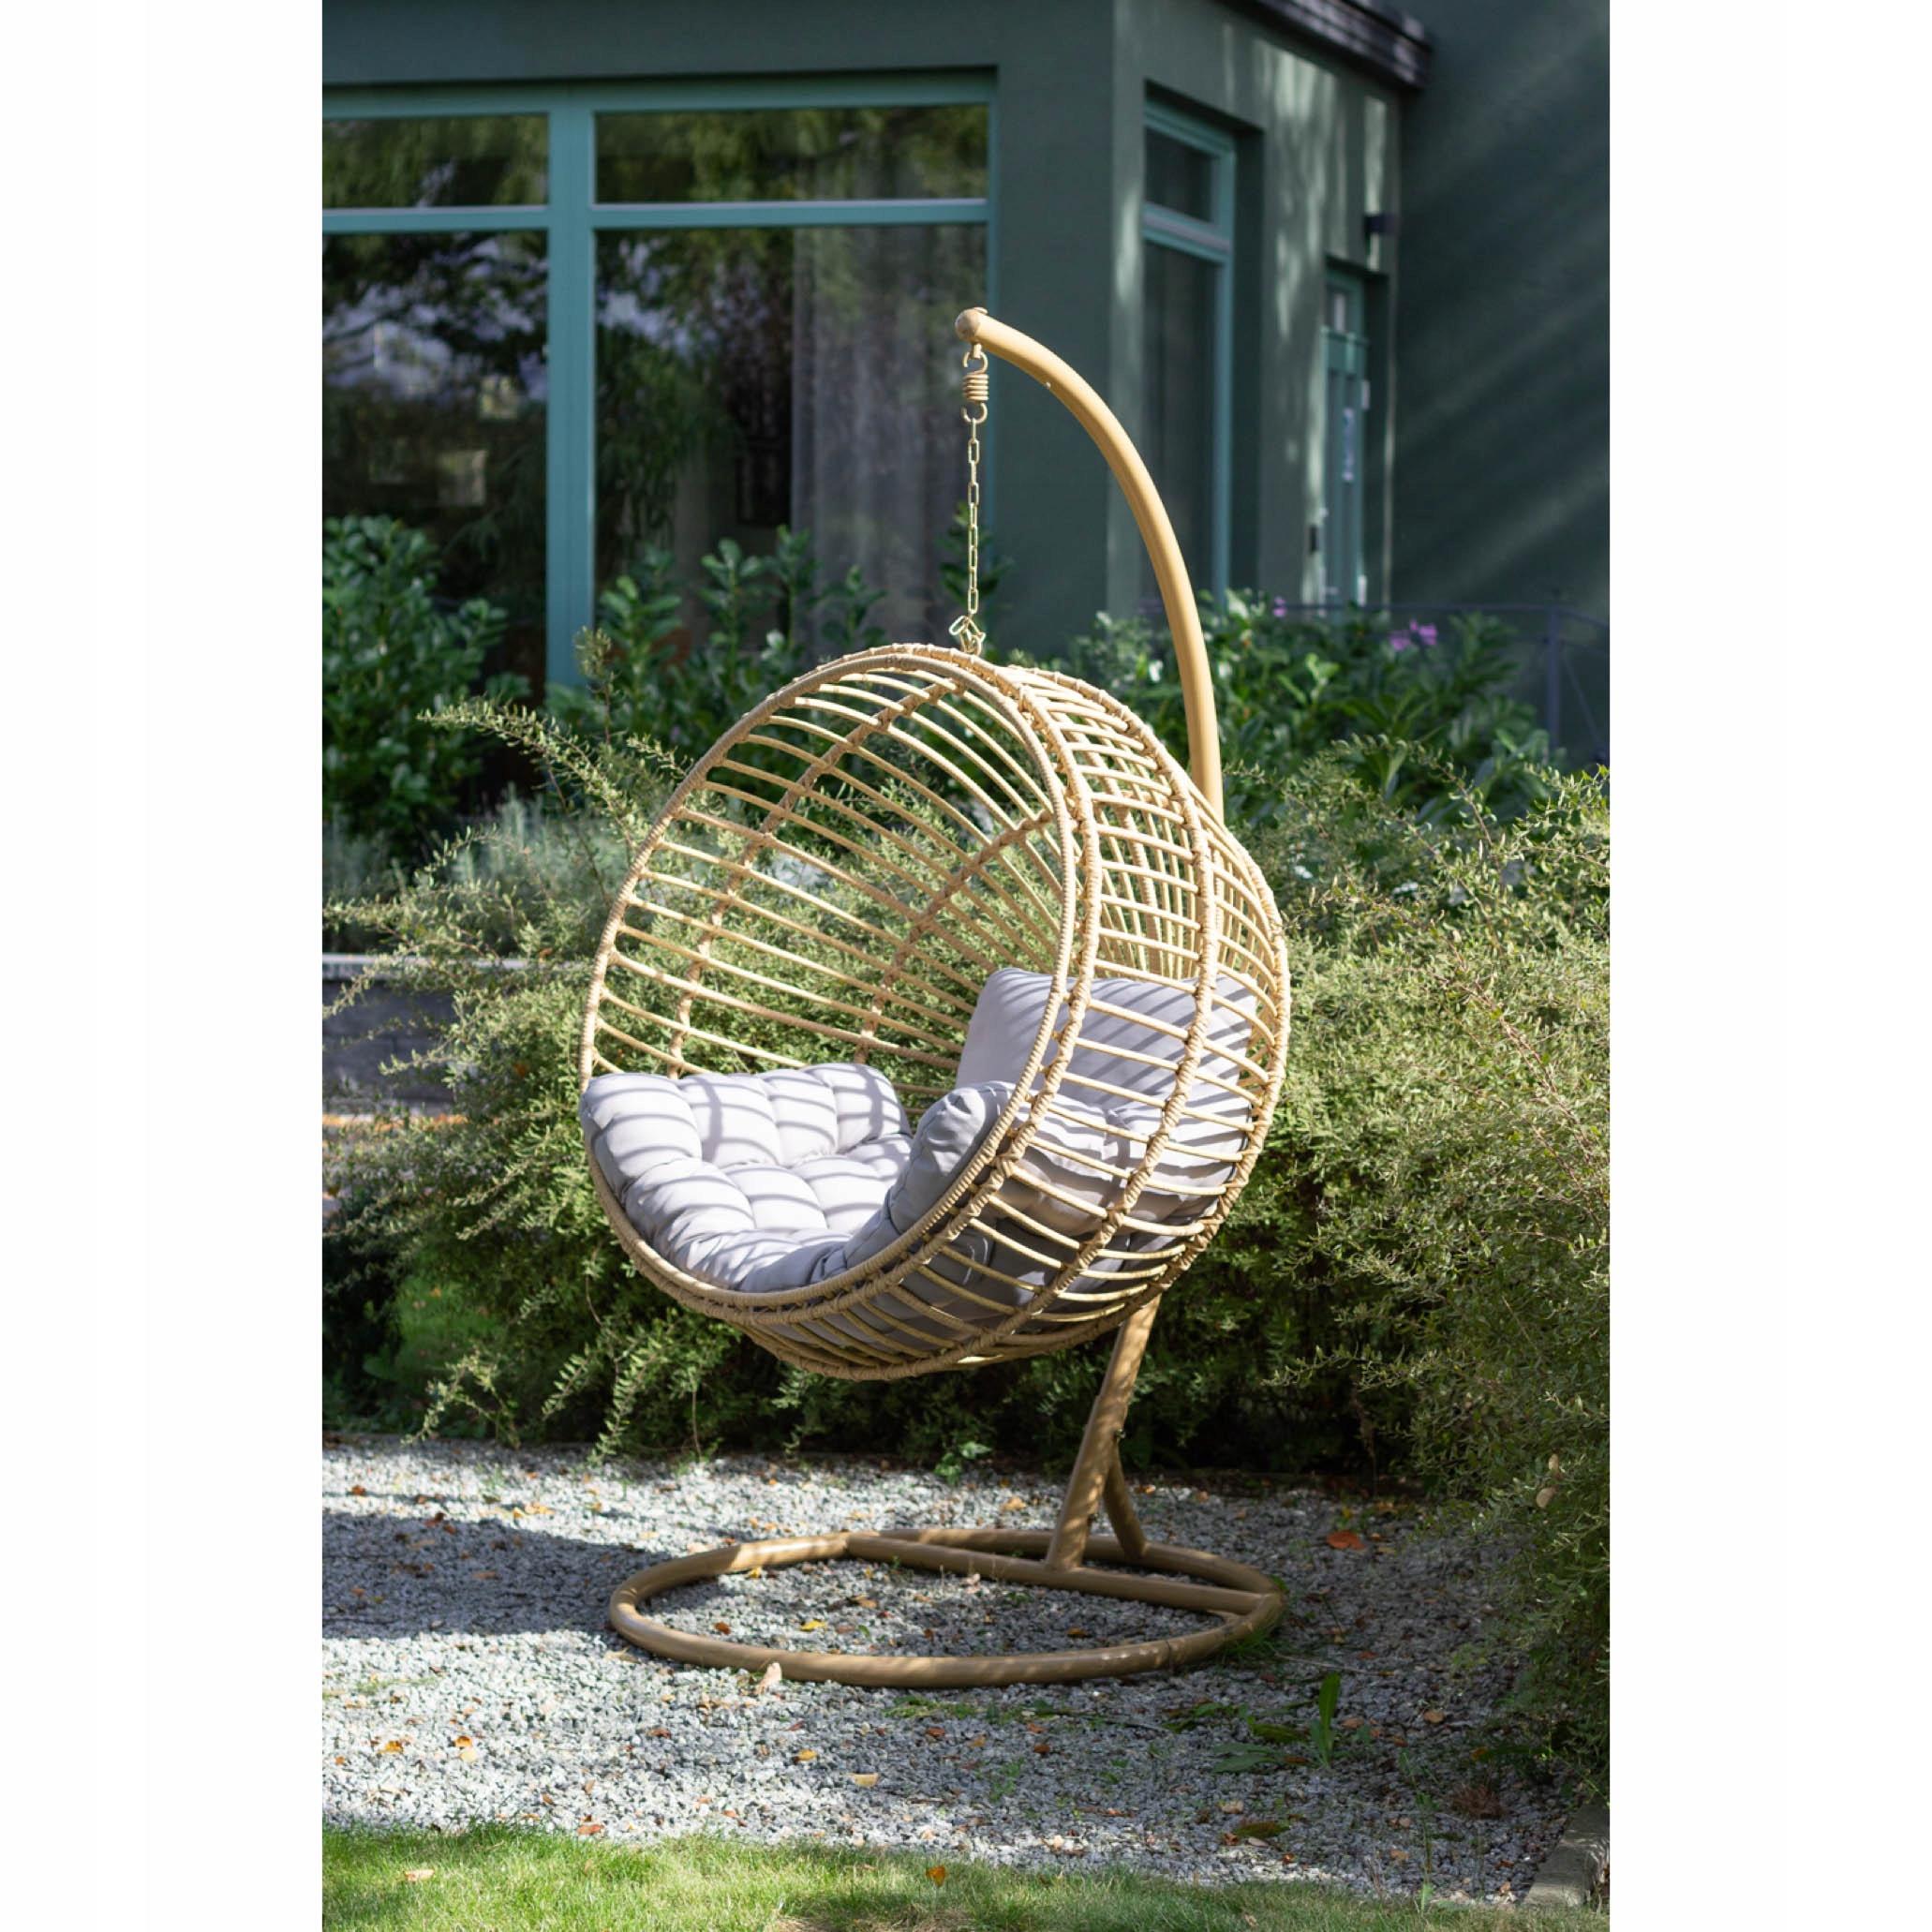 Závesná záhradná stolička STELLA kokon Kód produktu MV-1710-STELLA